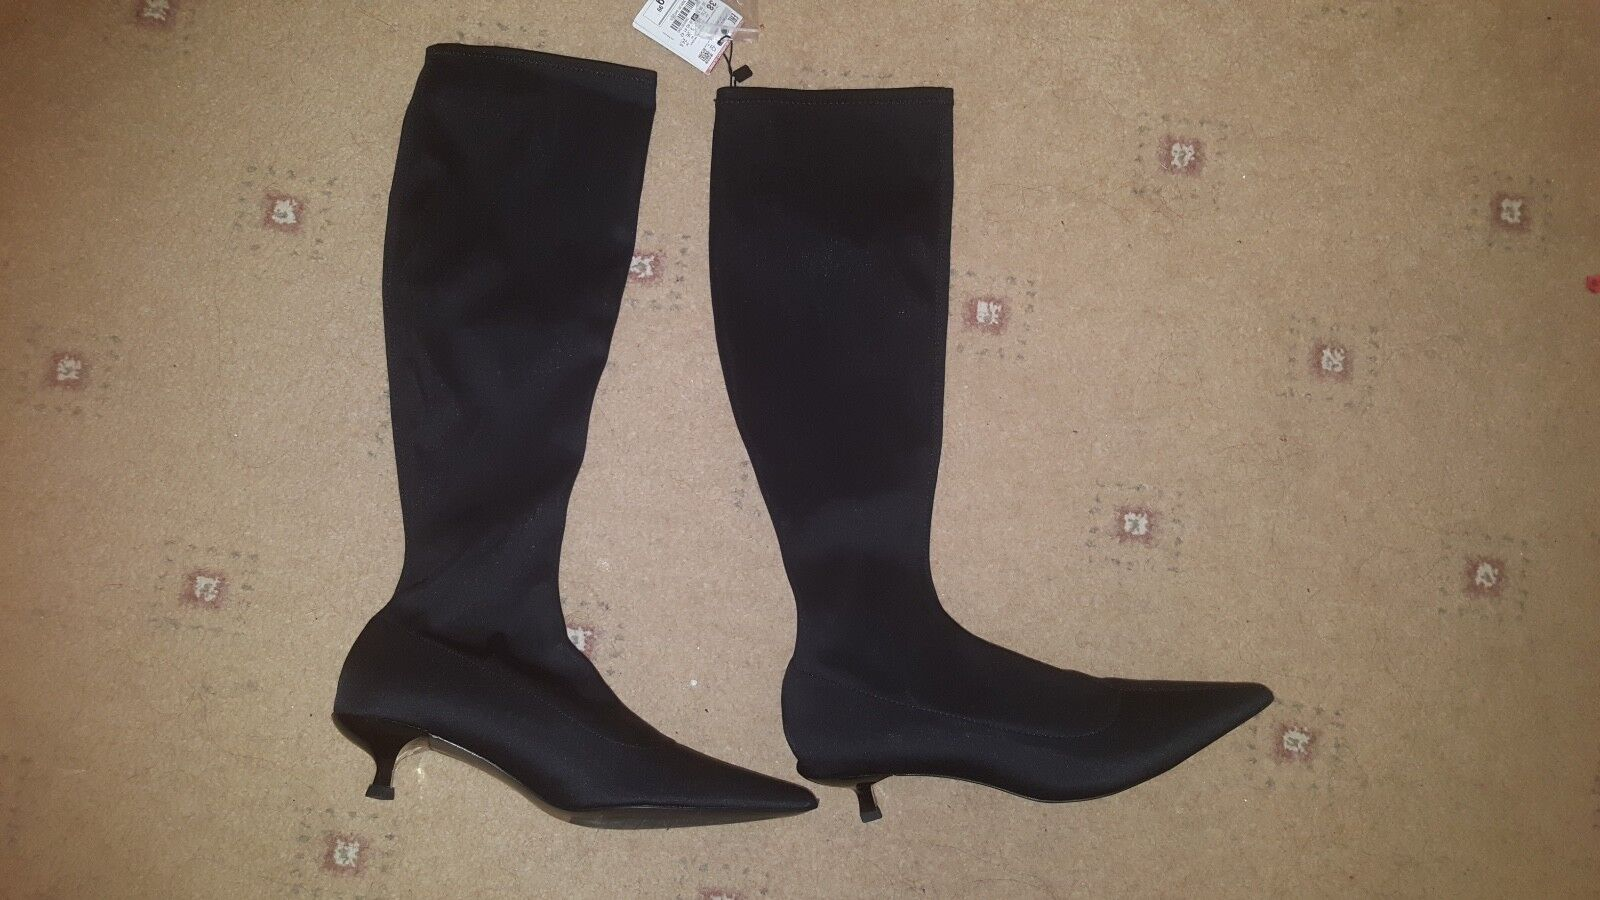 BNWT ZARA ZARA BNWT BLACK ELASTIC HIGH HEEL Stiefel Schuhe SIZE 5 38 2a3b47